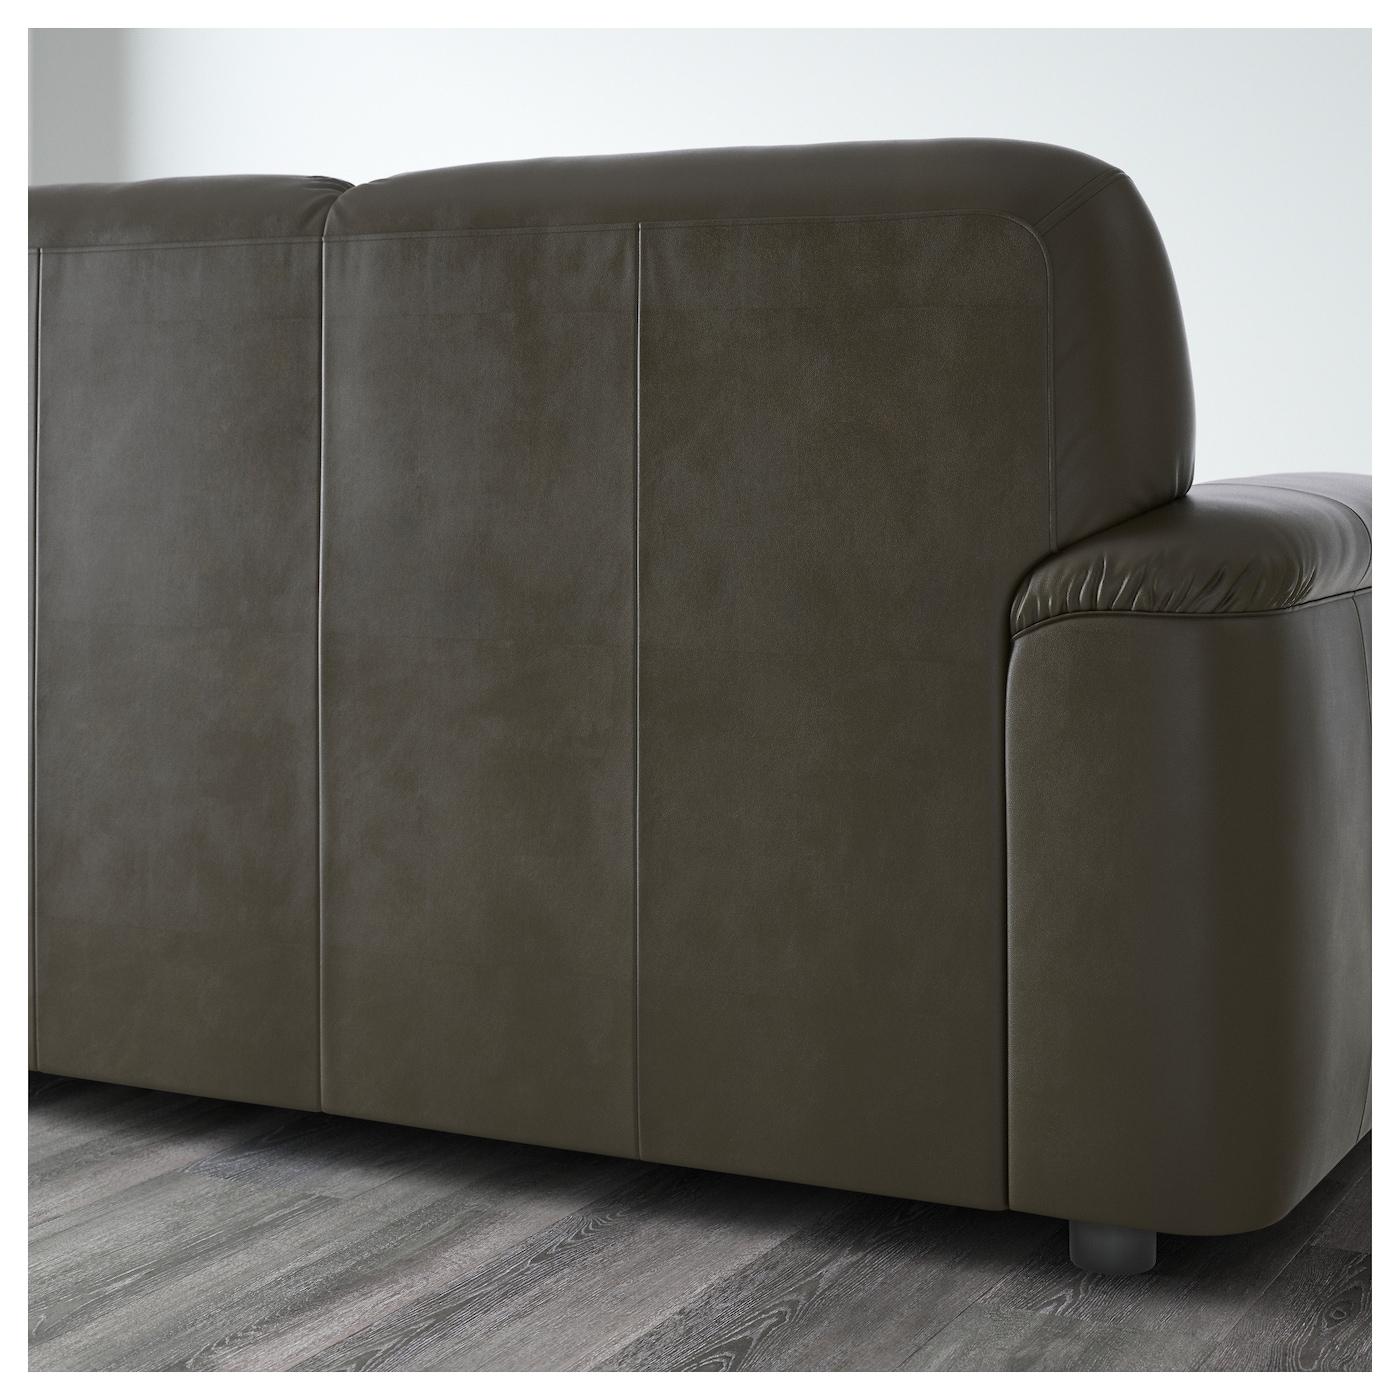 Timsfors three seat sofa mjuk kimstad dark green ikea for Couch gb sofa